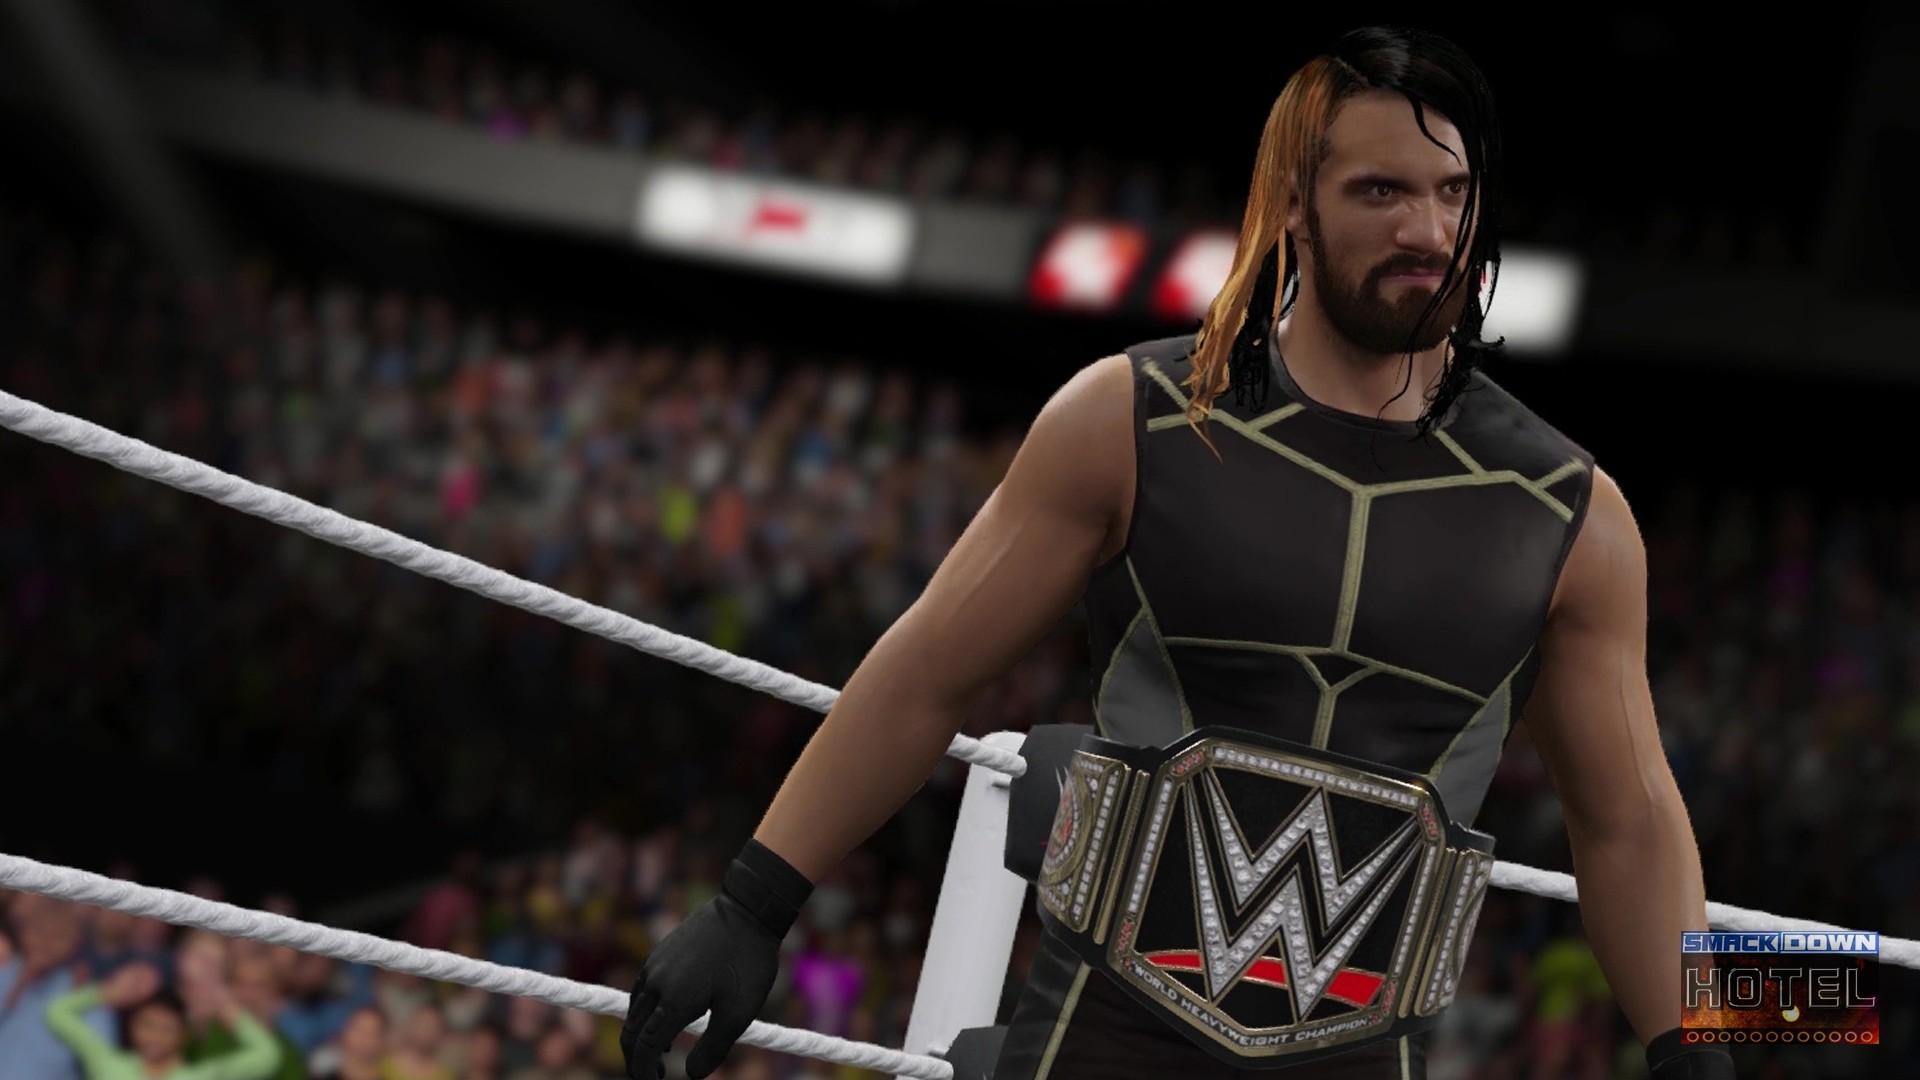 WWE2K16 PC Randy Orton WWE2K16 PC Kevin Owens WWE2K16 MovesPack2 WWE2K16  RollinsPanoramic WWE2K16 Launch SethRollins WWE2K16 Launch DirtyPin WWE2K16  Trailer …